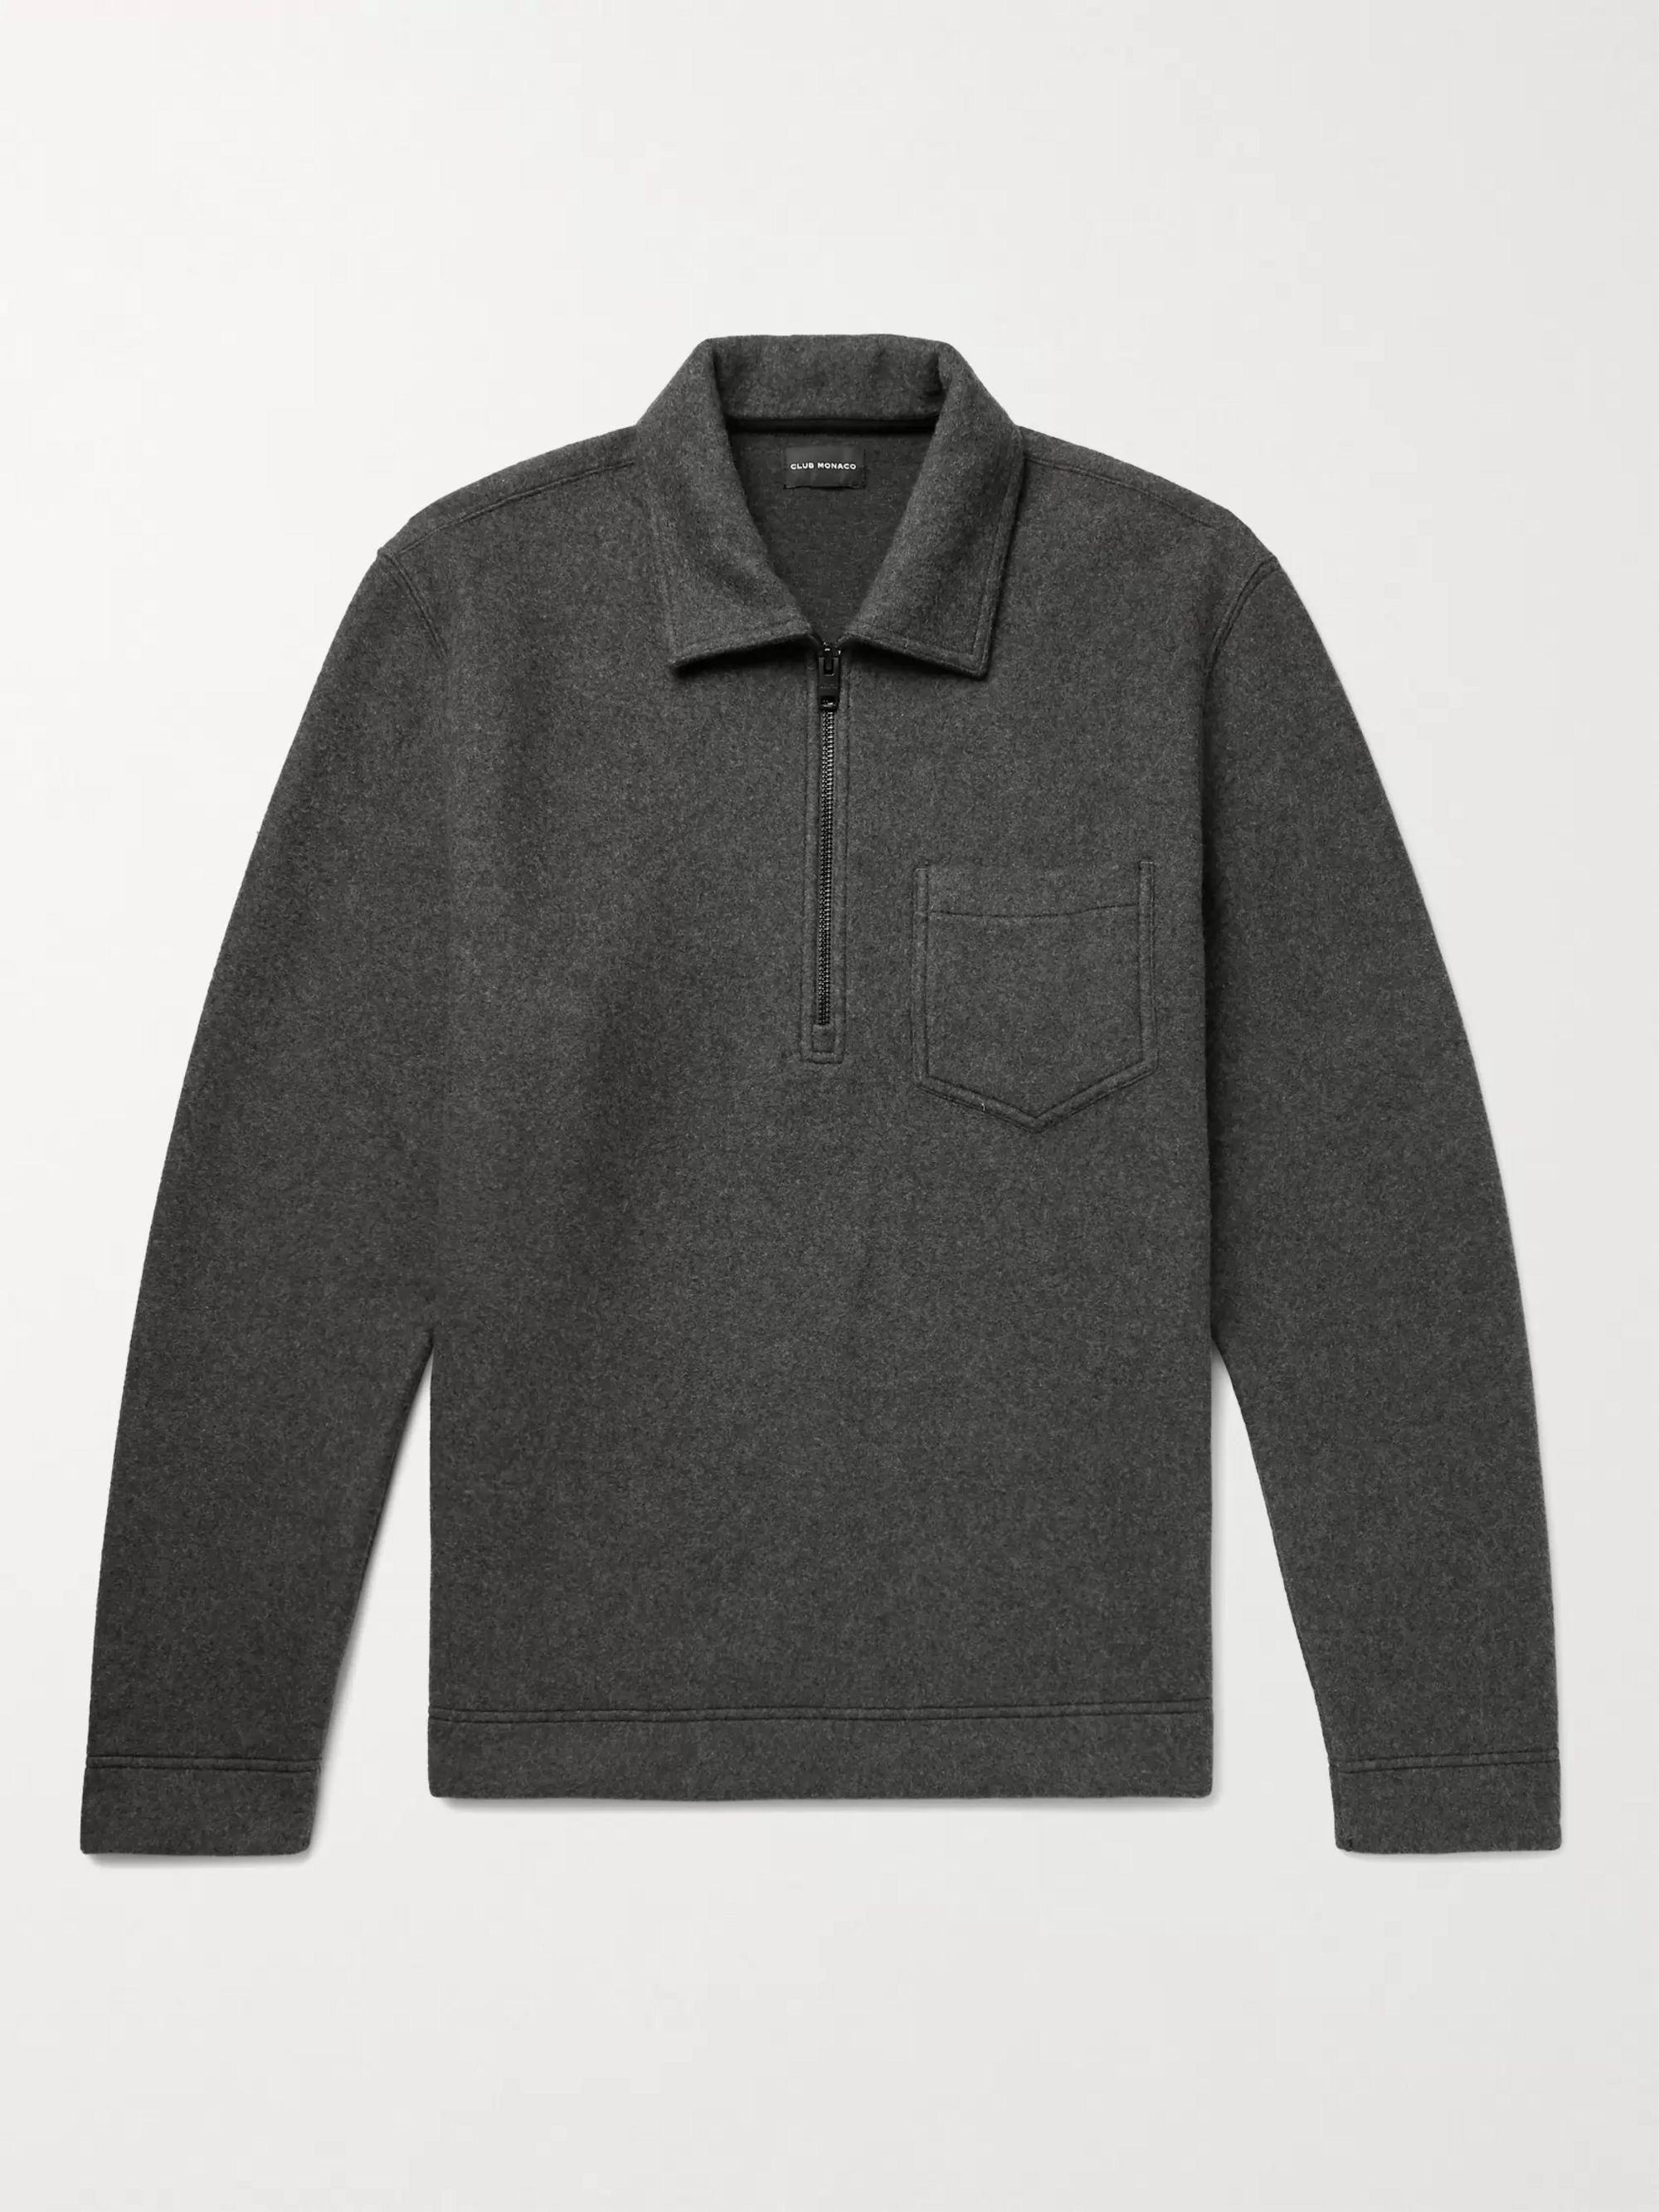 CLUB MONACO Melange Brushed Cotton-Blend Half-Zip Sweatshirt